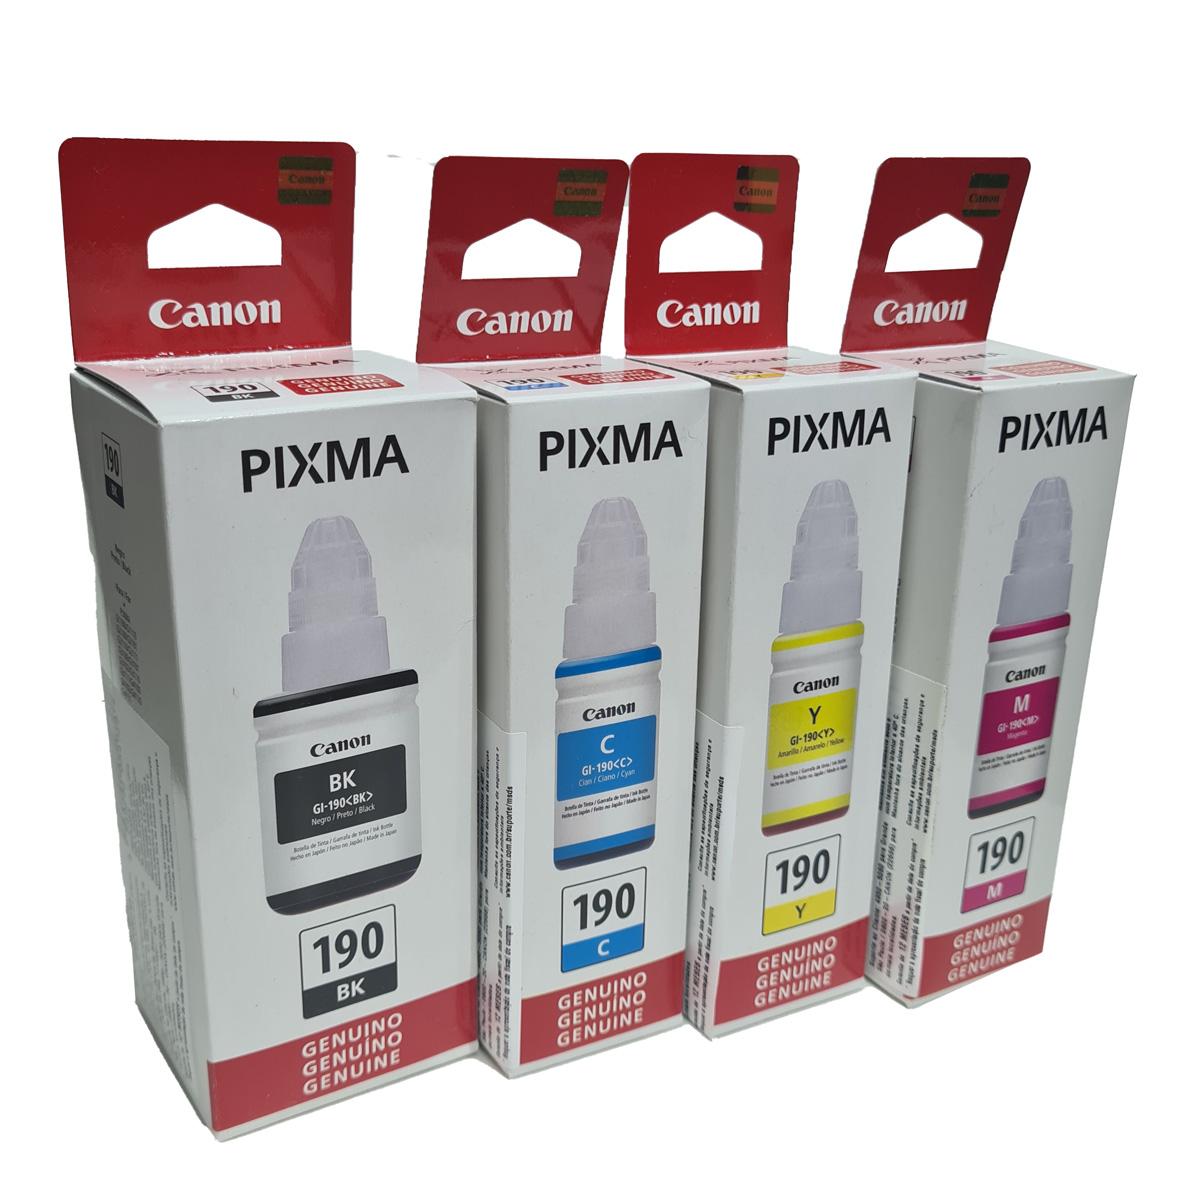 Kit 4 Refis de Tinta Canon GI190 para Pixma G1100 2100 3100